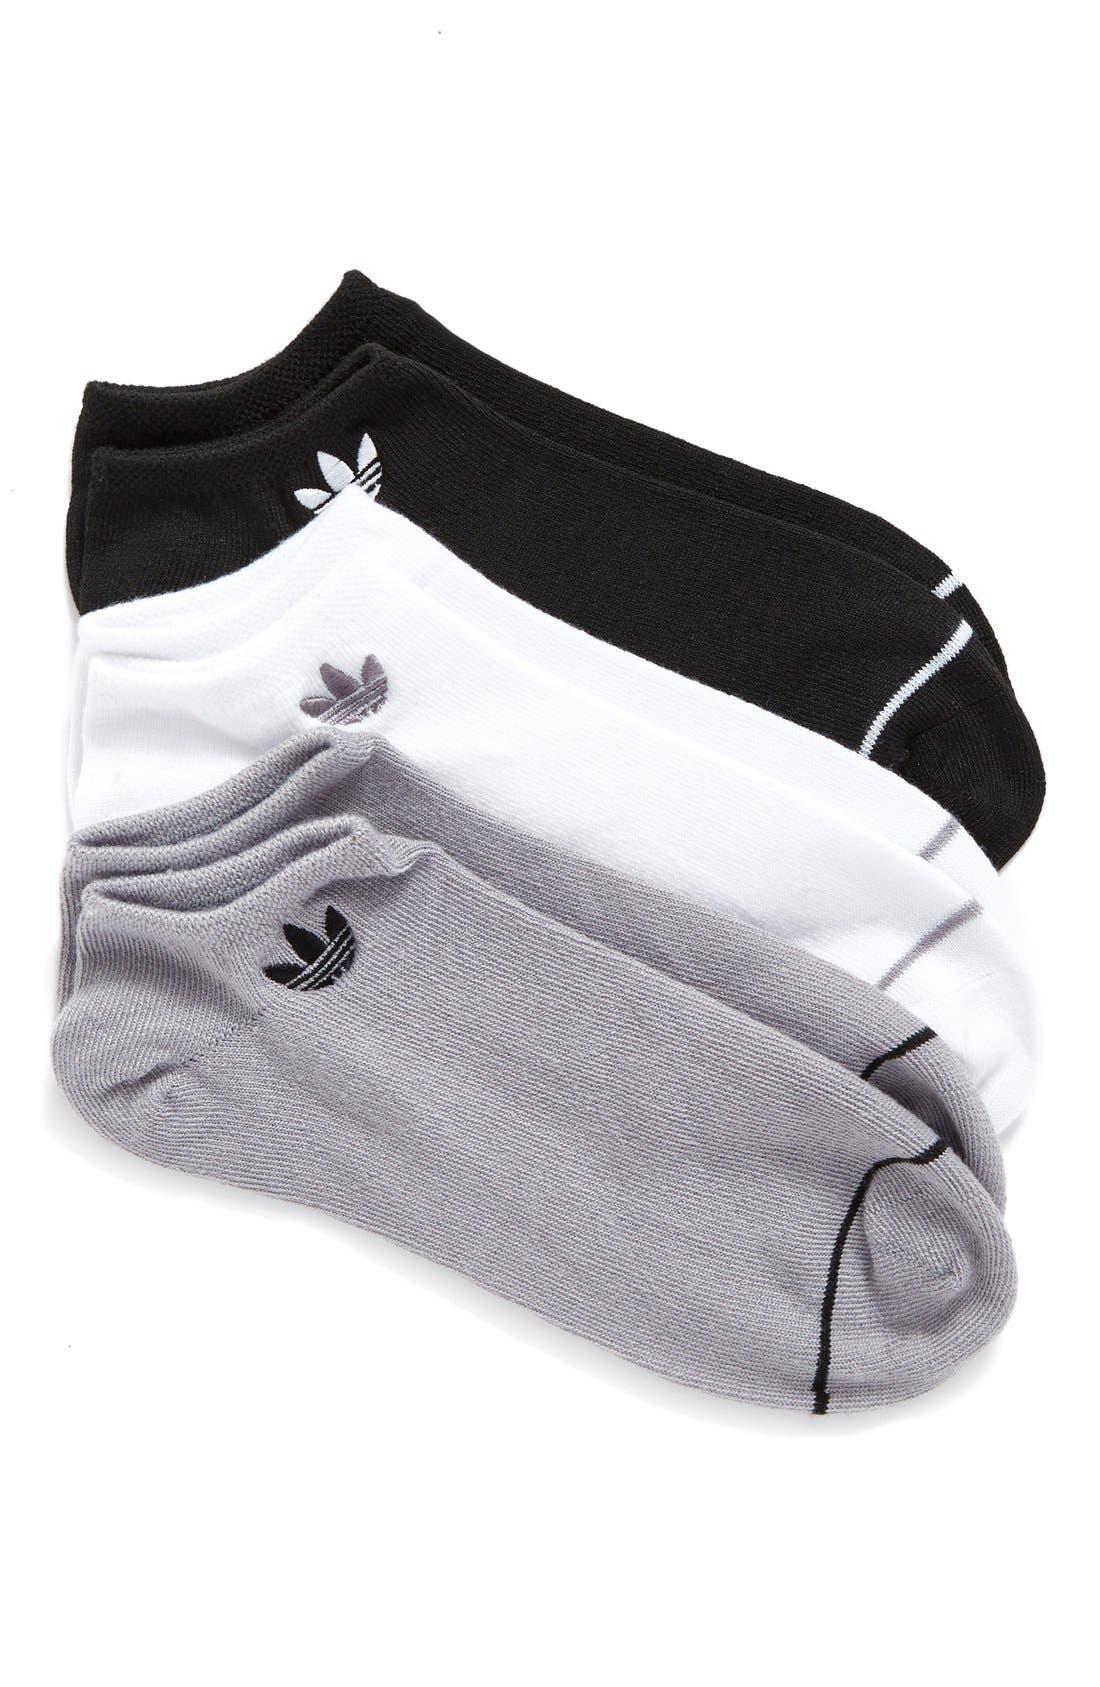 Superlite 3-Pack Socks,                             Main thumbnail 1, color,                             Black